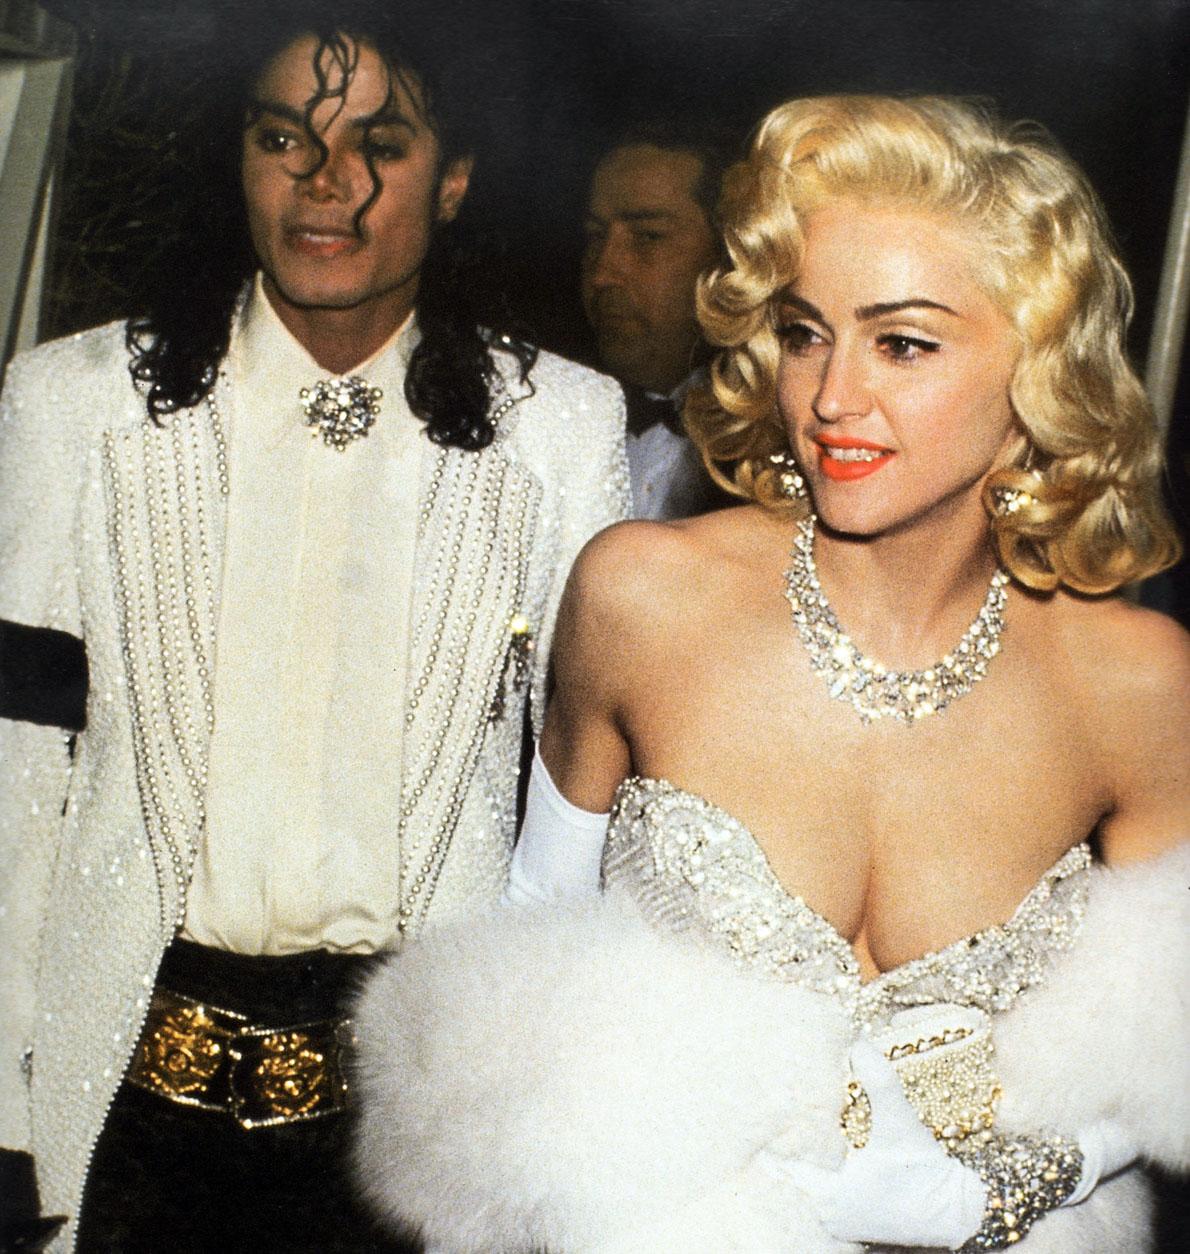 Michael Jackson and Madonna at the Oscars, 1990 - a photo ...